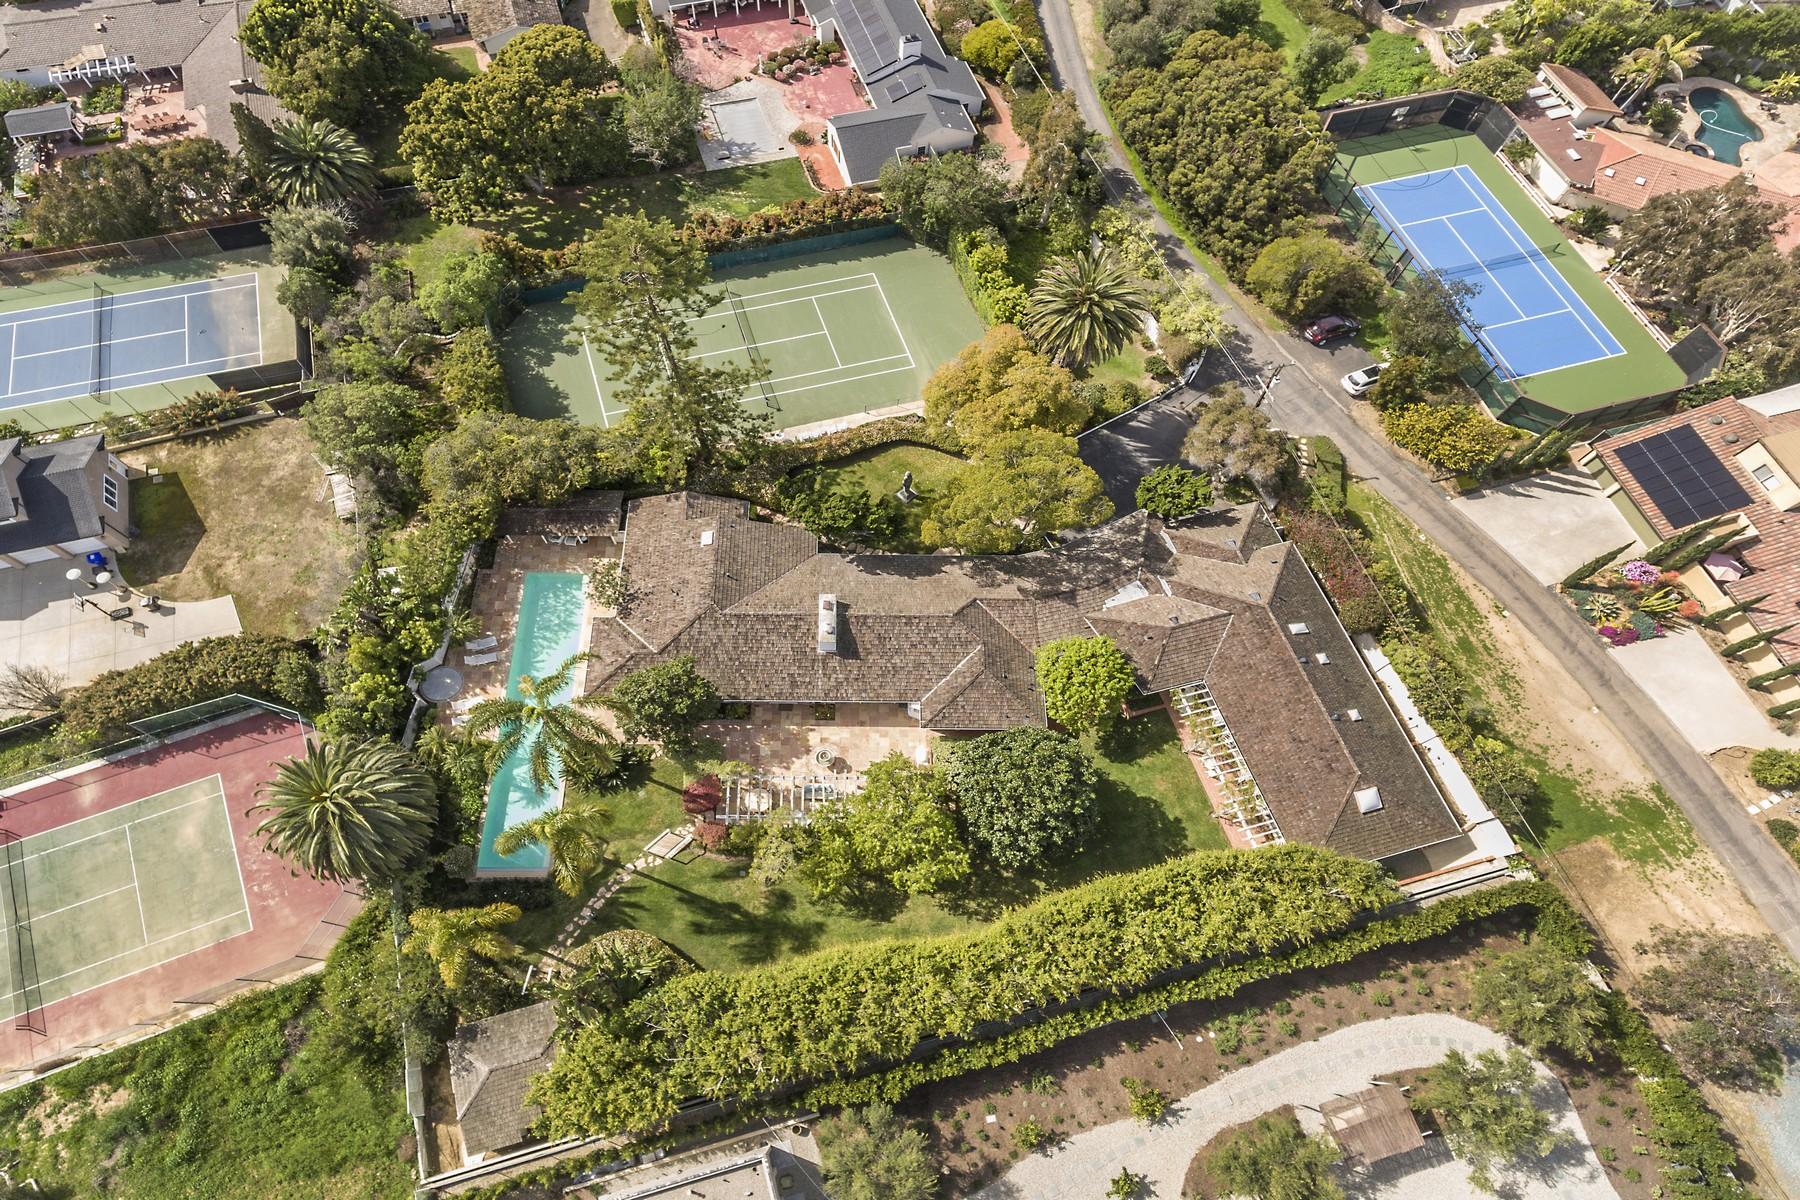 Single Family Homes for Sale at One-Acre Private Road Near Beach La Jolla, California 92037 United States